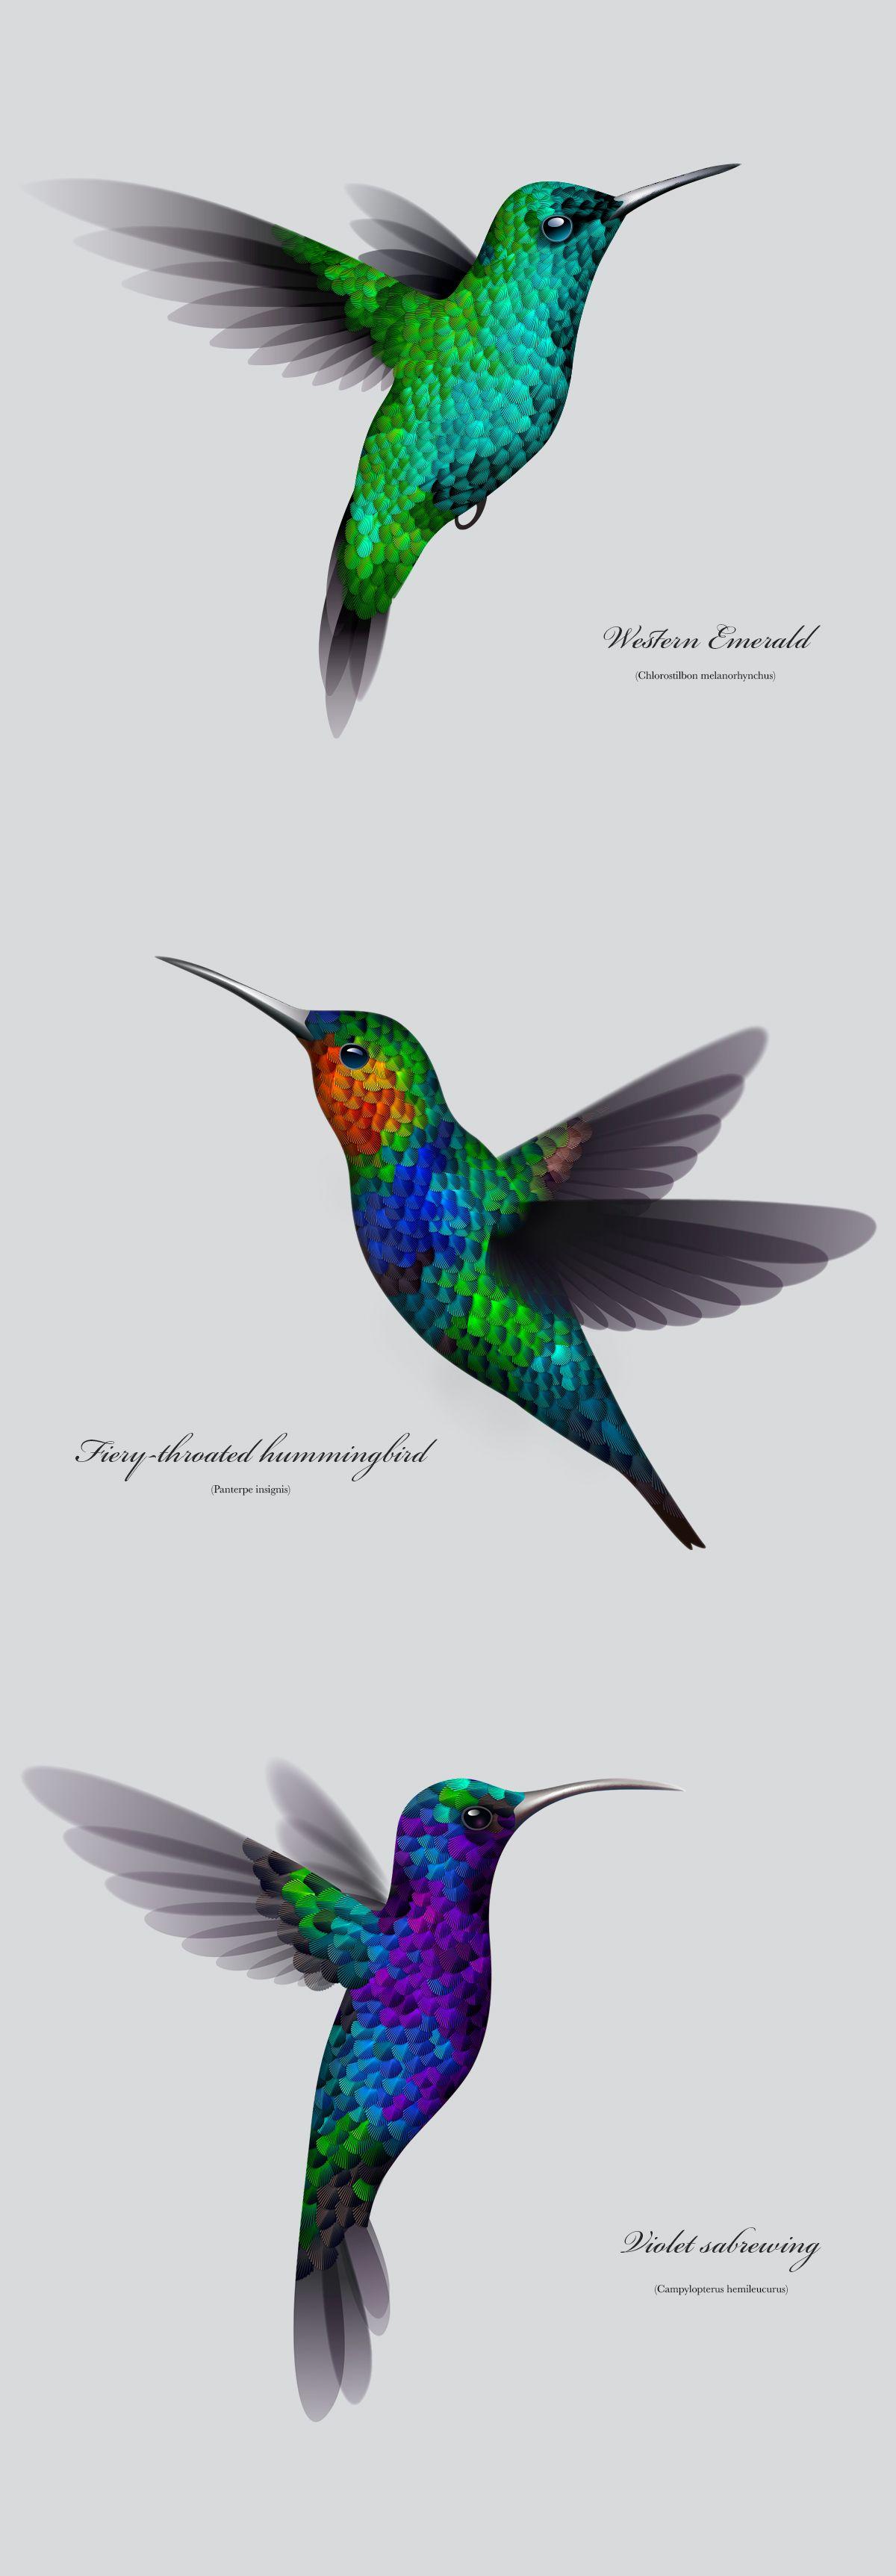 Illustrator Experiment: Making a Hummingbird   Create